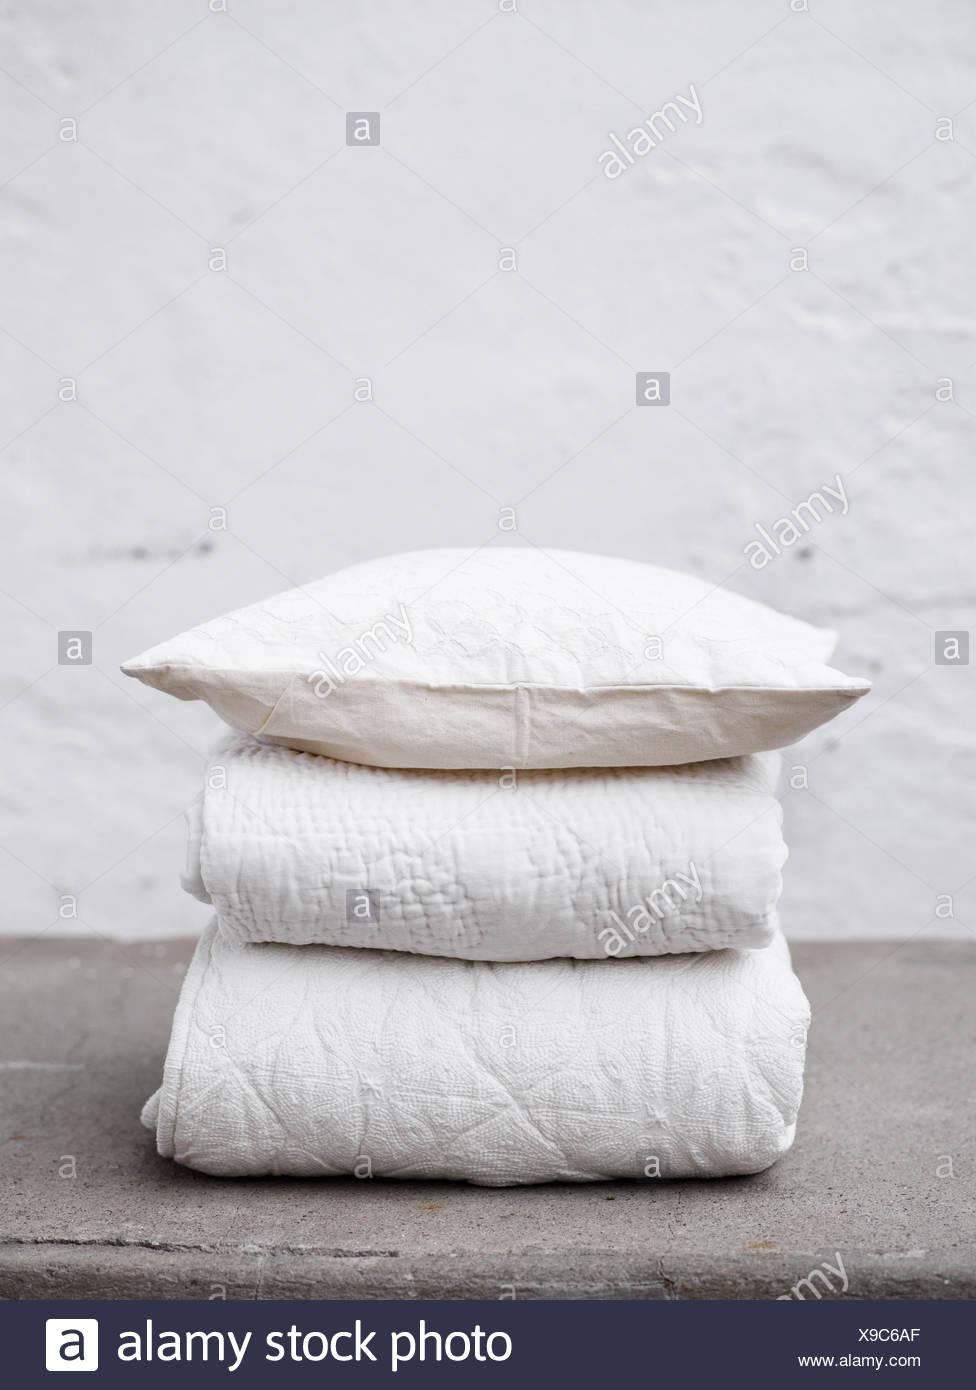 Scandinavia, Sweden, Stockholm, Folded blankets and quilt, close-up - Stock Image